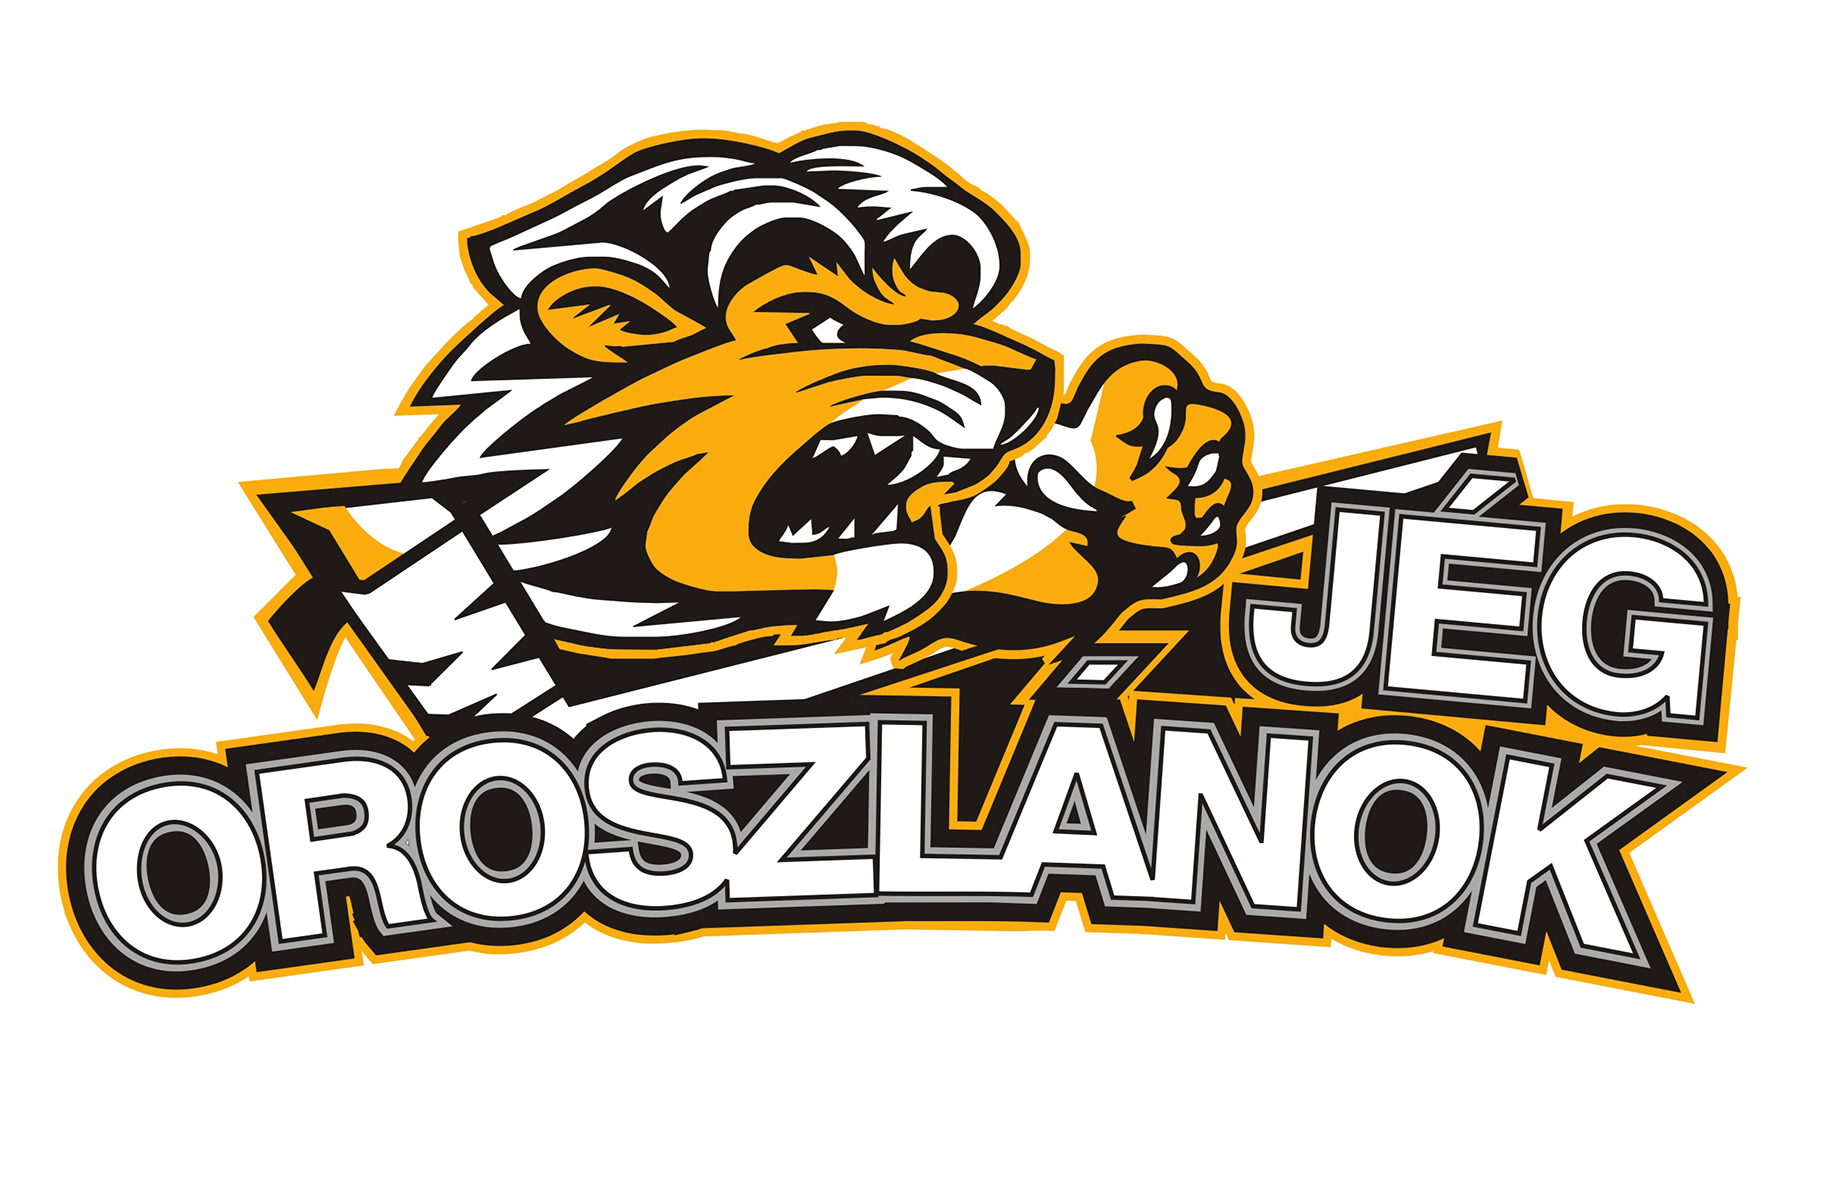 szigeti_oroszlanok_logo.jpg